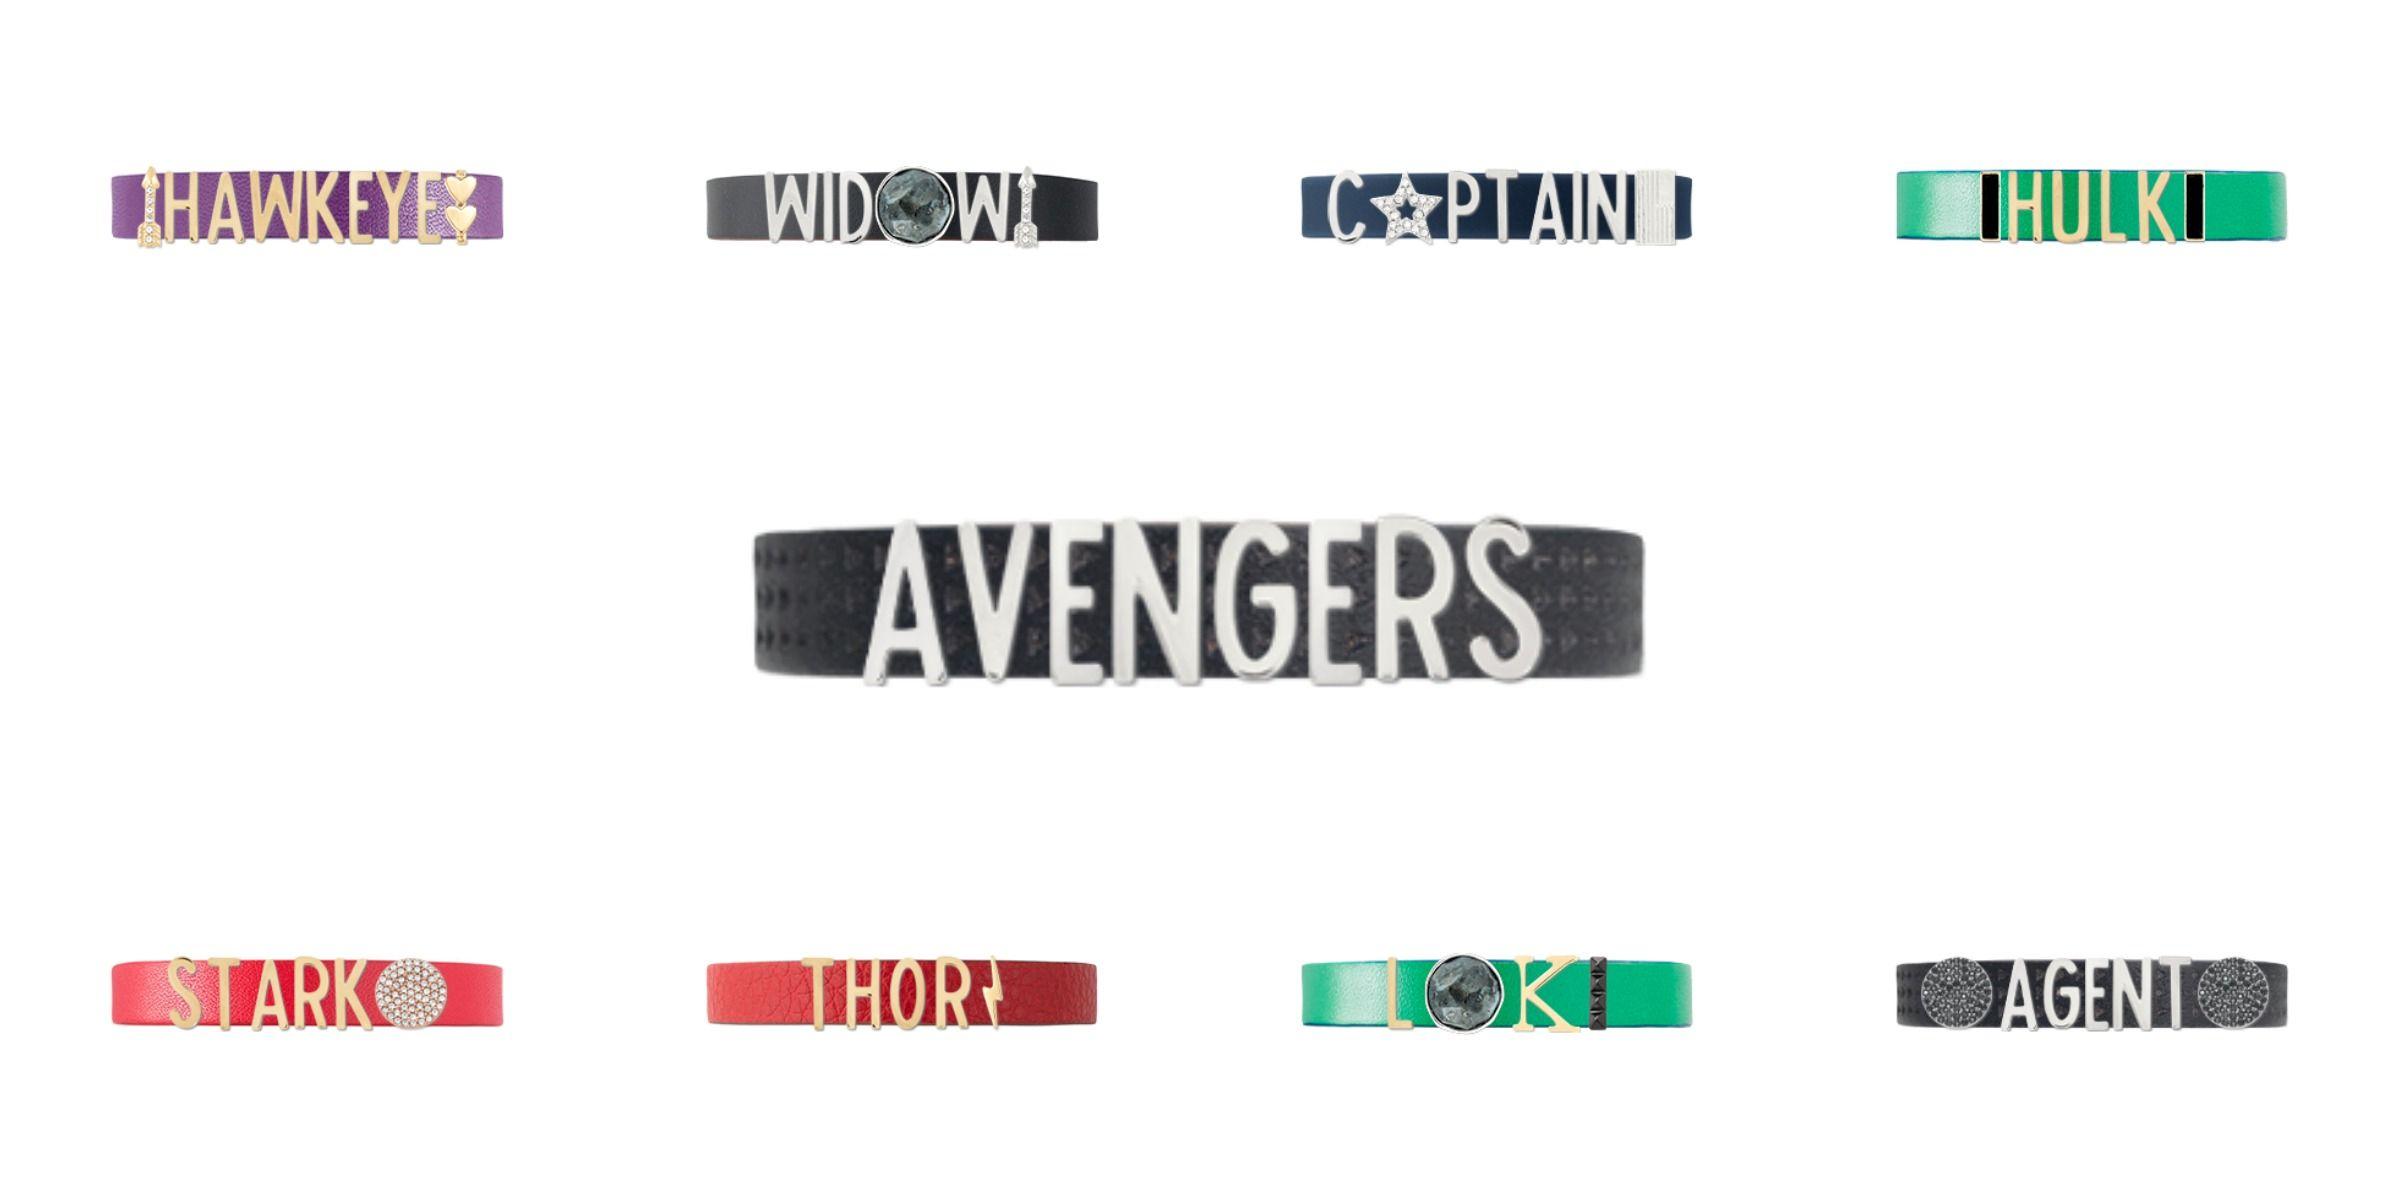 Avengers inpsired jewelry #Marvel #avengers #jewelry #Hulk #CaptainAmerica #Black Widow #Hawkeye #Thor #Loki #IronMan #KeepCollective